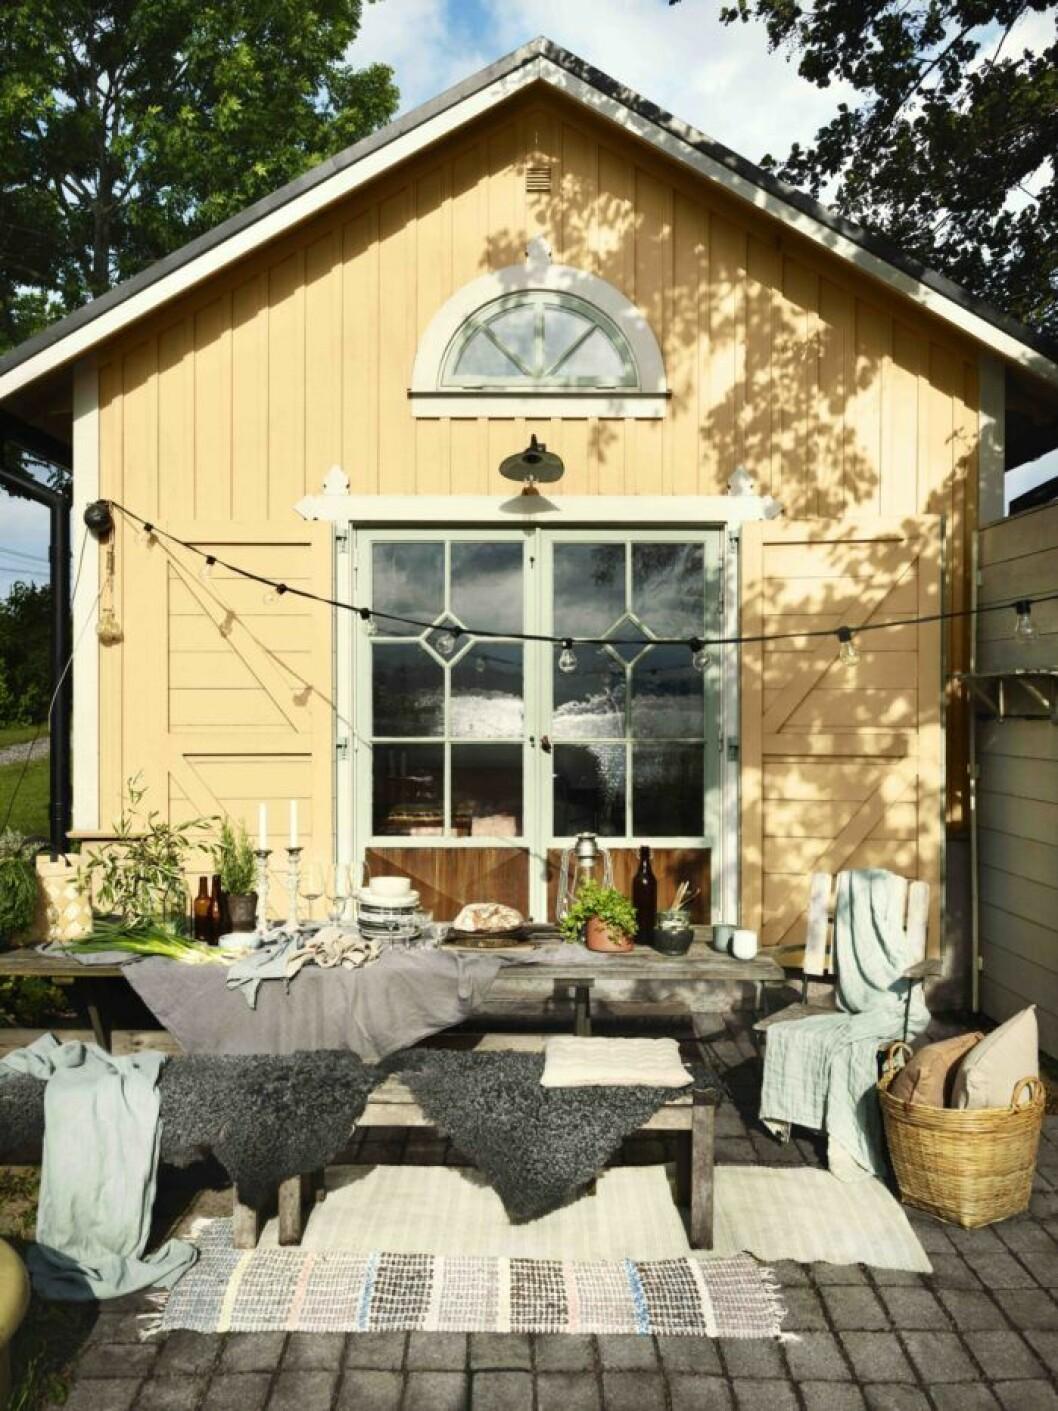 Skapa rum i rummet utomhus i sommar